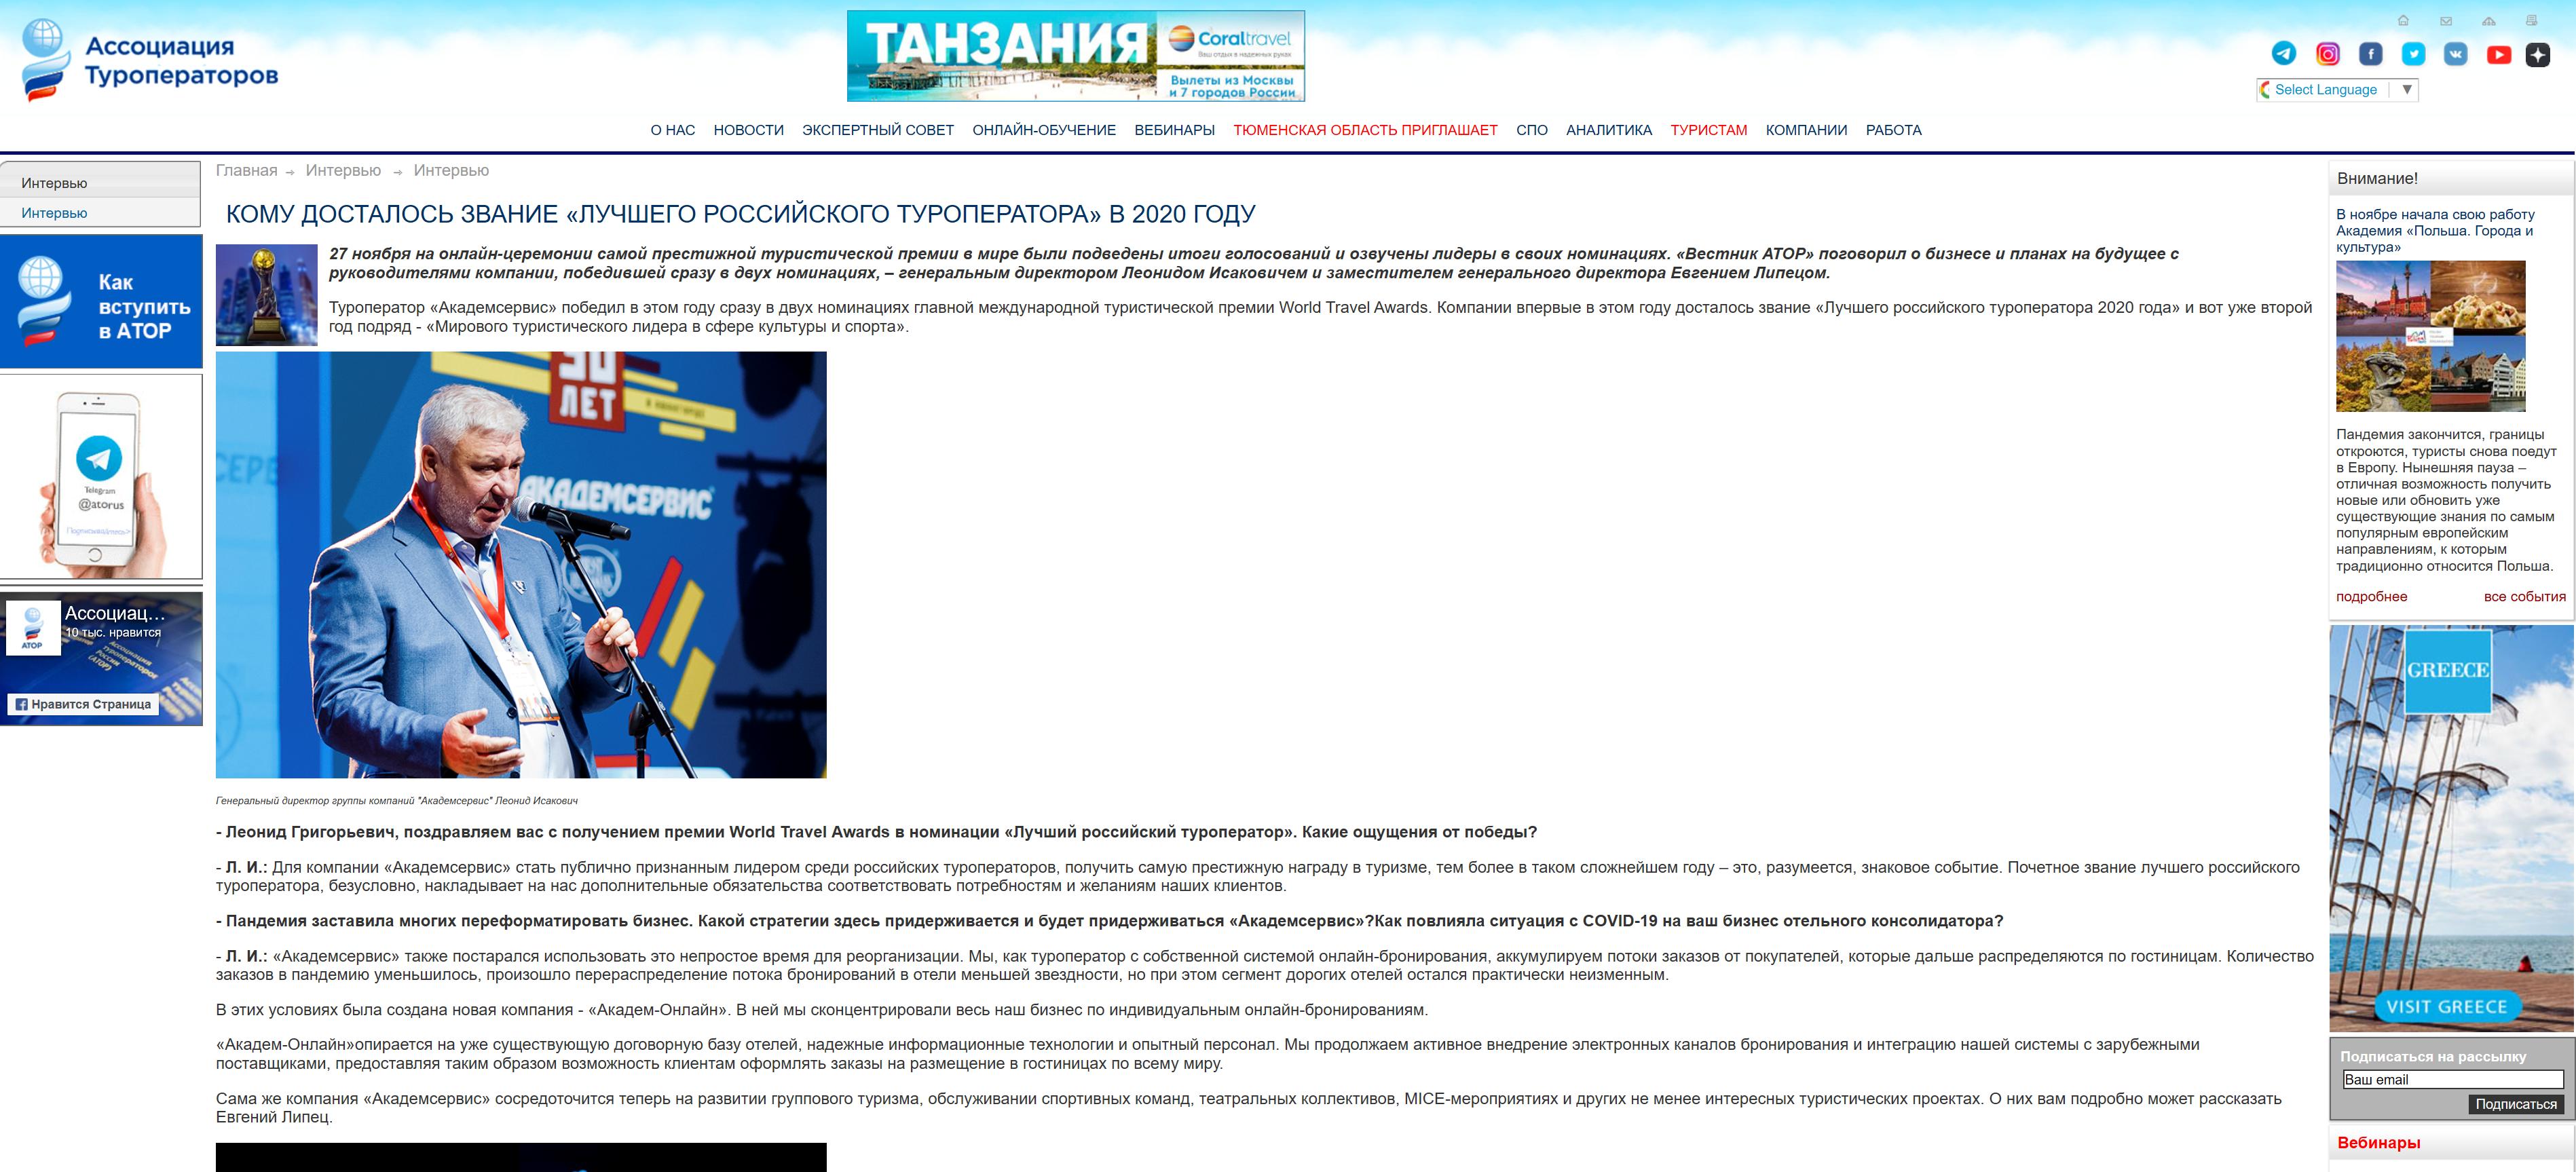 Ассоциация туроператоров (АТОР), www.atorus.ru, 03.12.2020